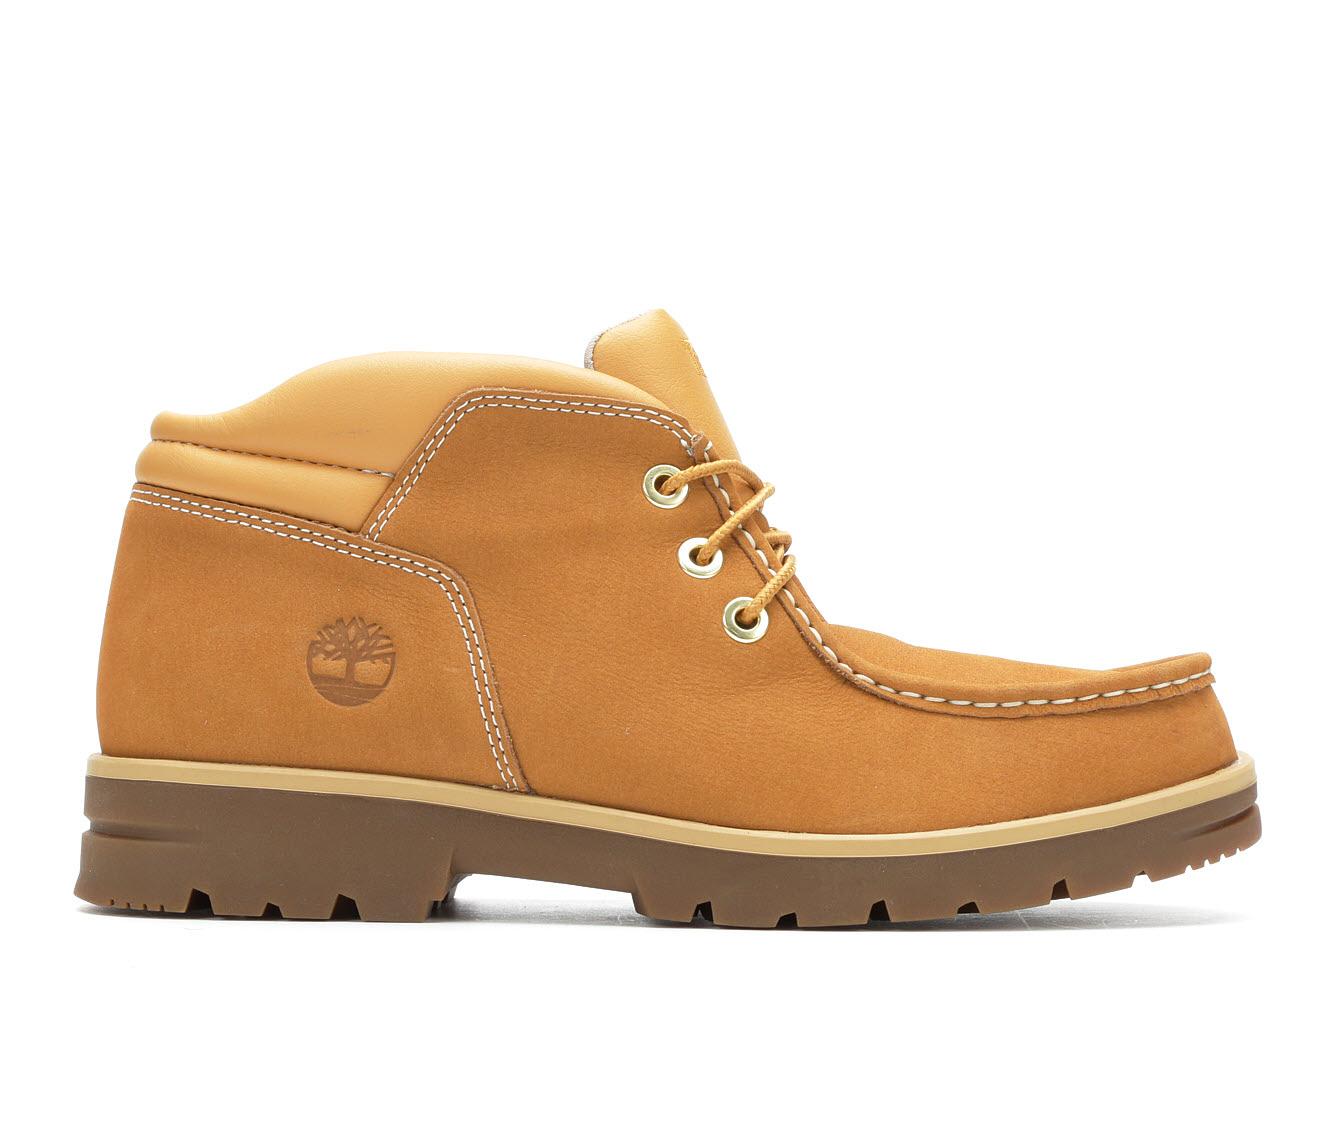 Timberland Newtonbrook Moc Toe Chukka Men's Boots (Beige Leather)